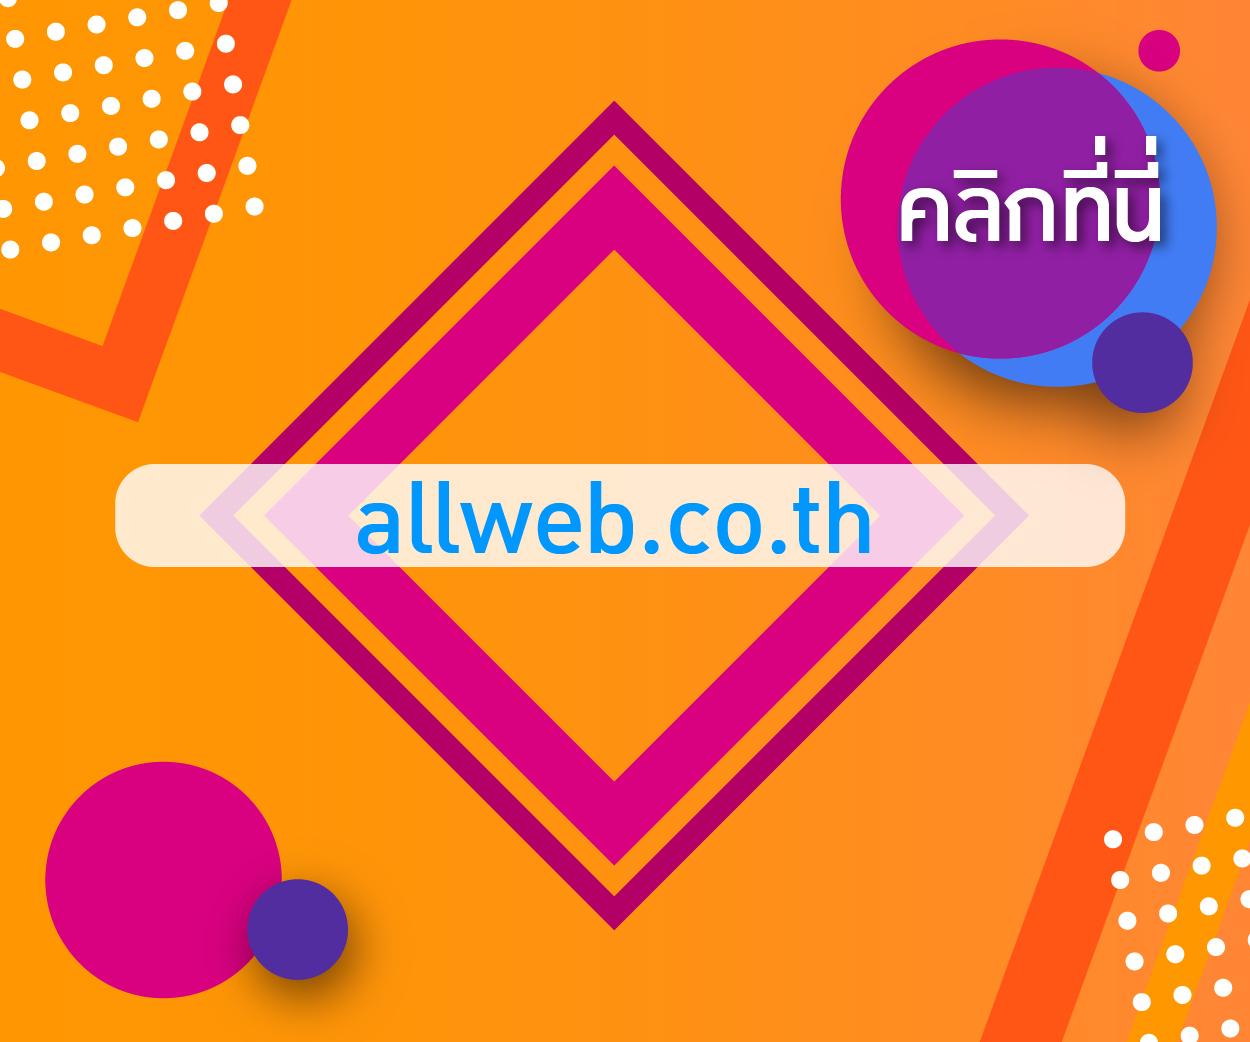 allweb 2019